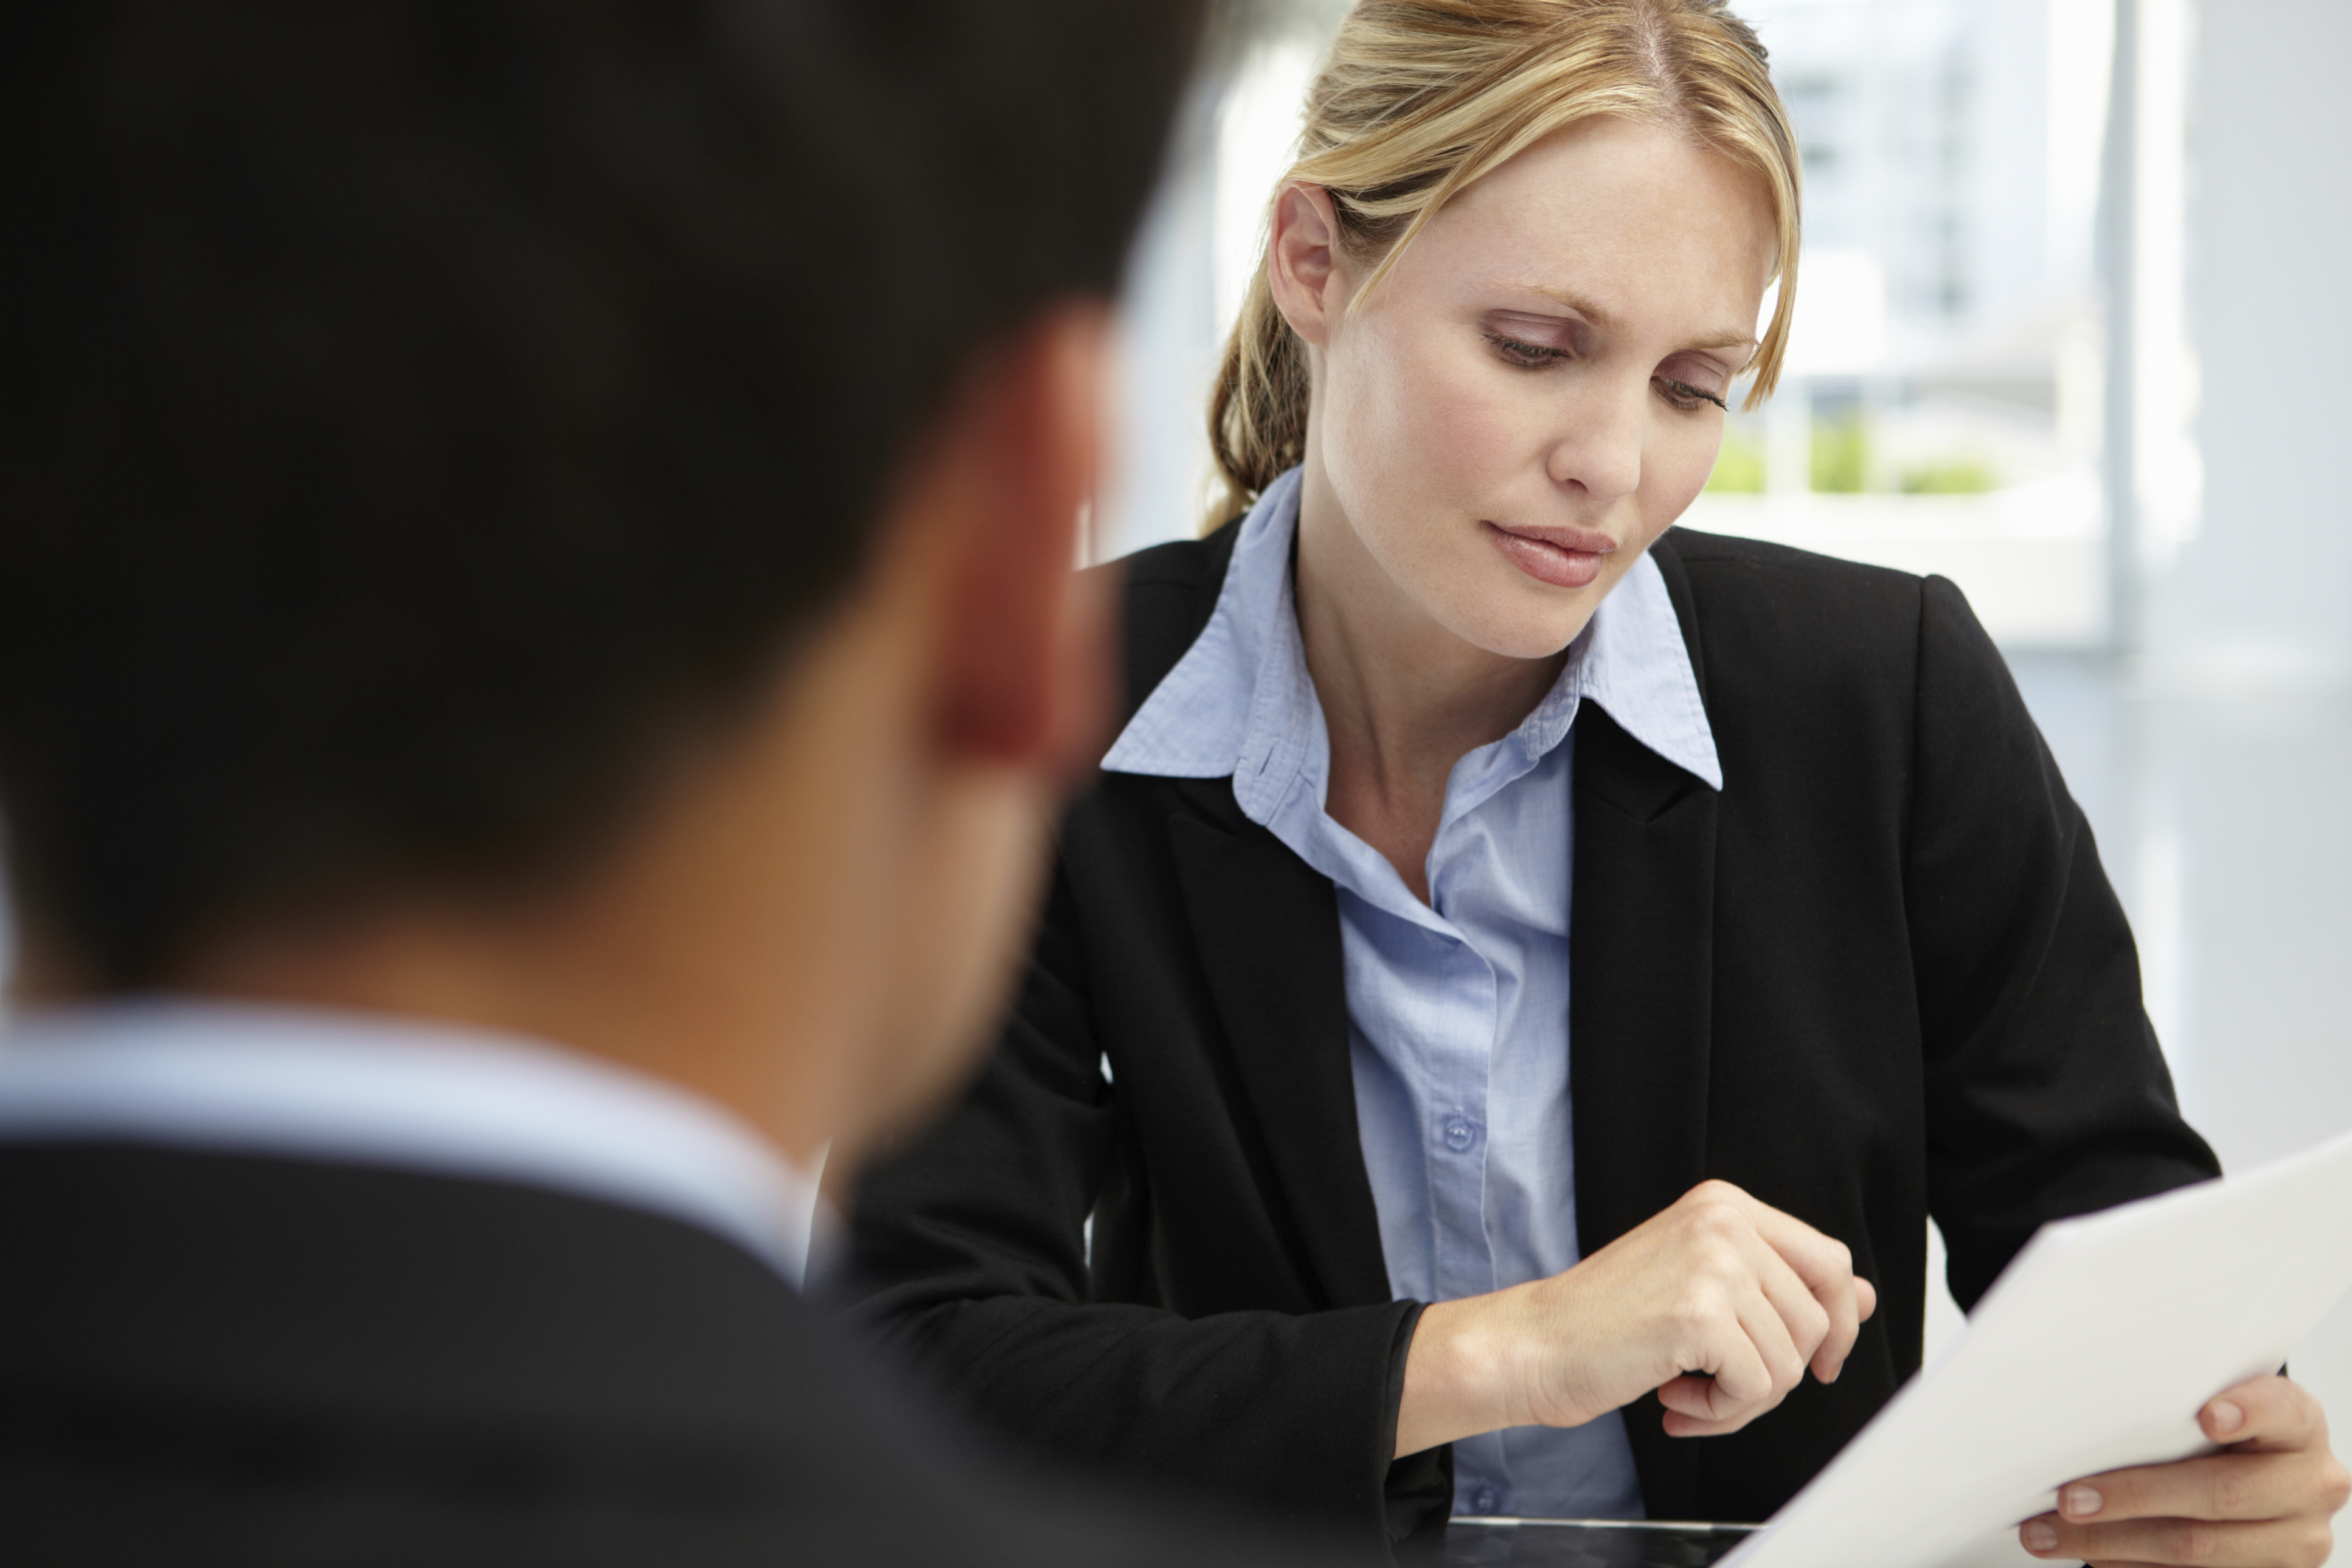 Study: Job interview process is getting longer